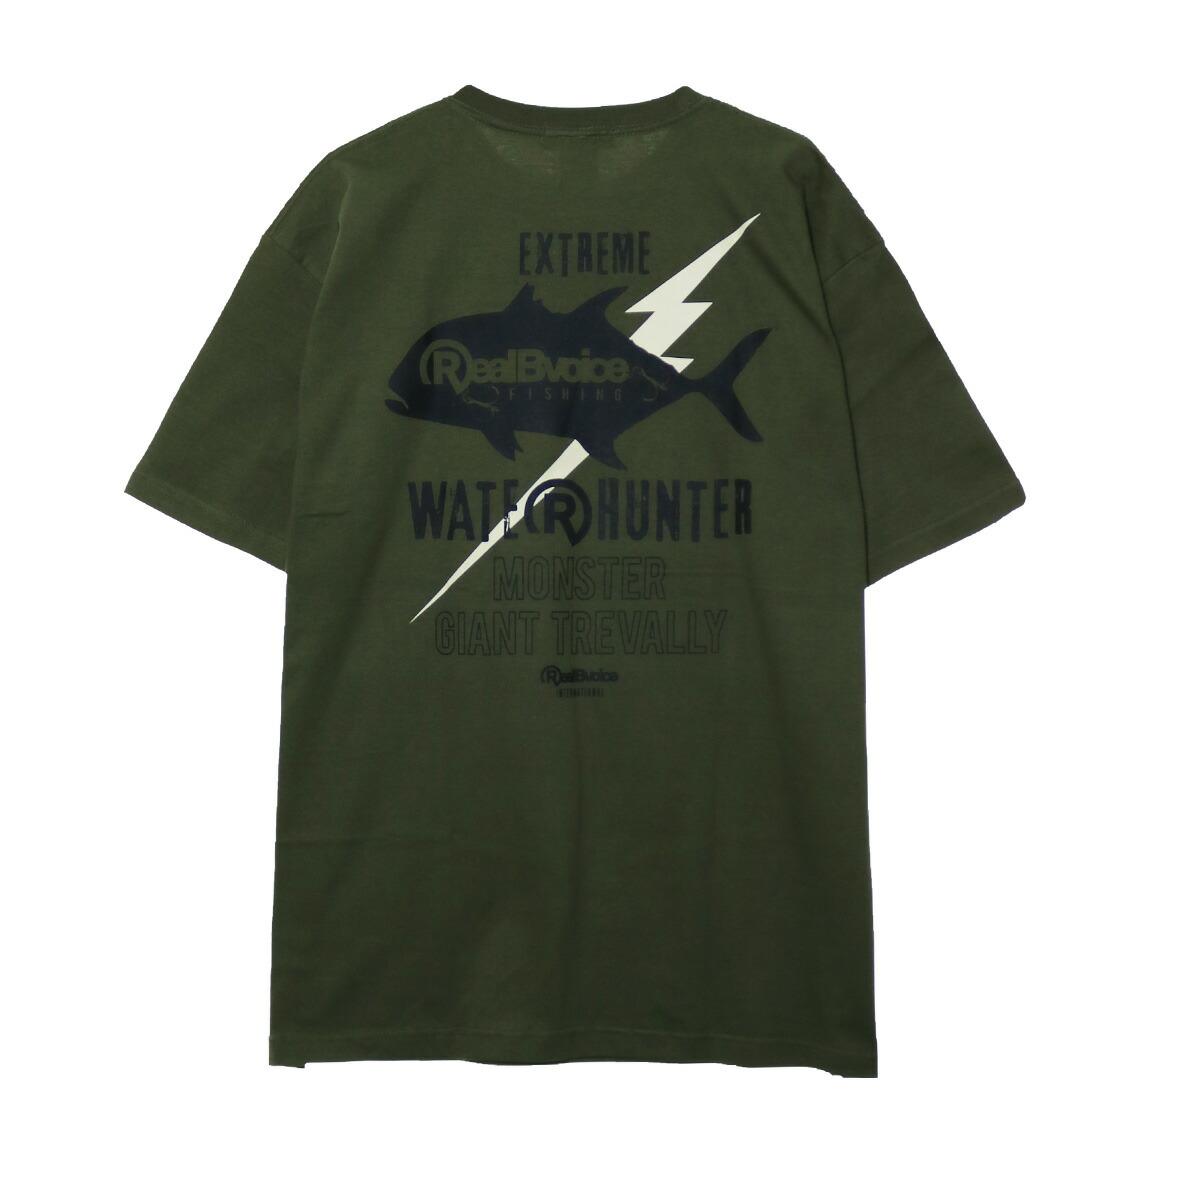 FISHING RBV GT HUNTER T-SHIRT BIG SIZE